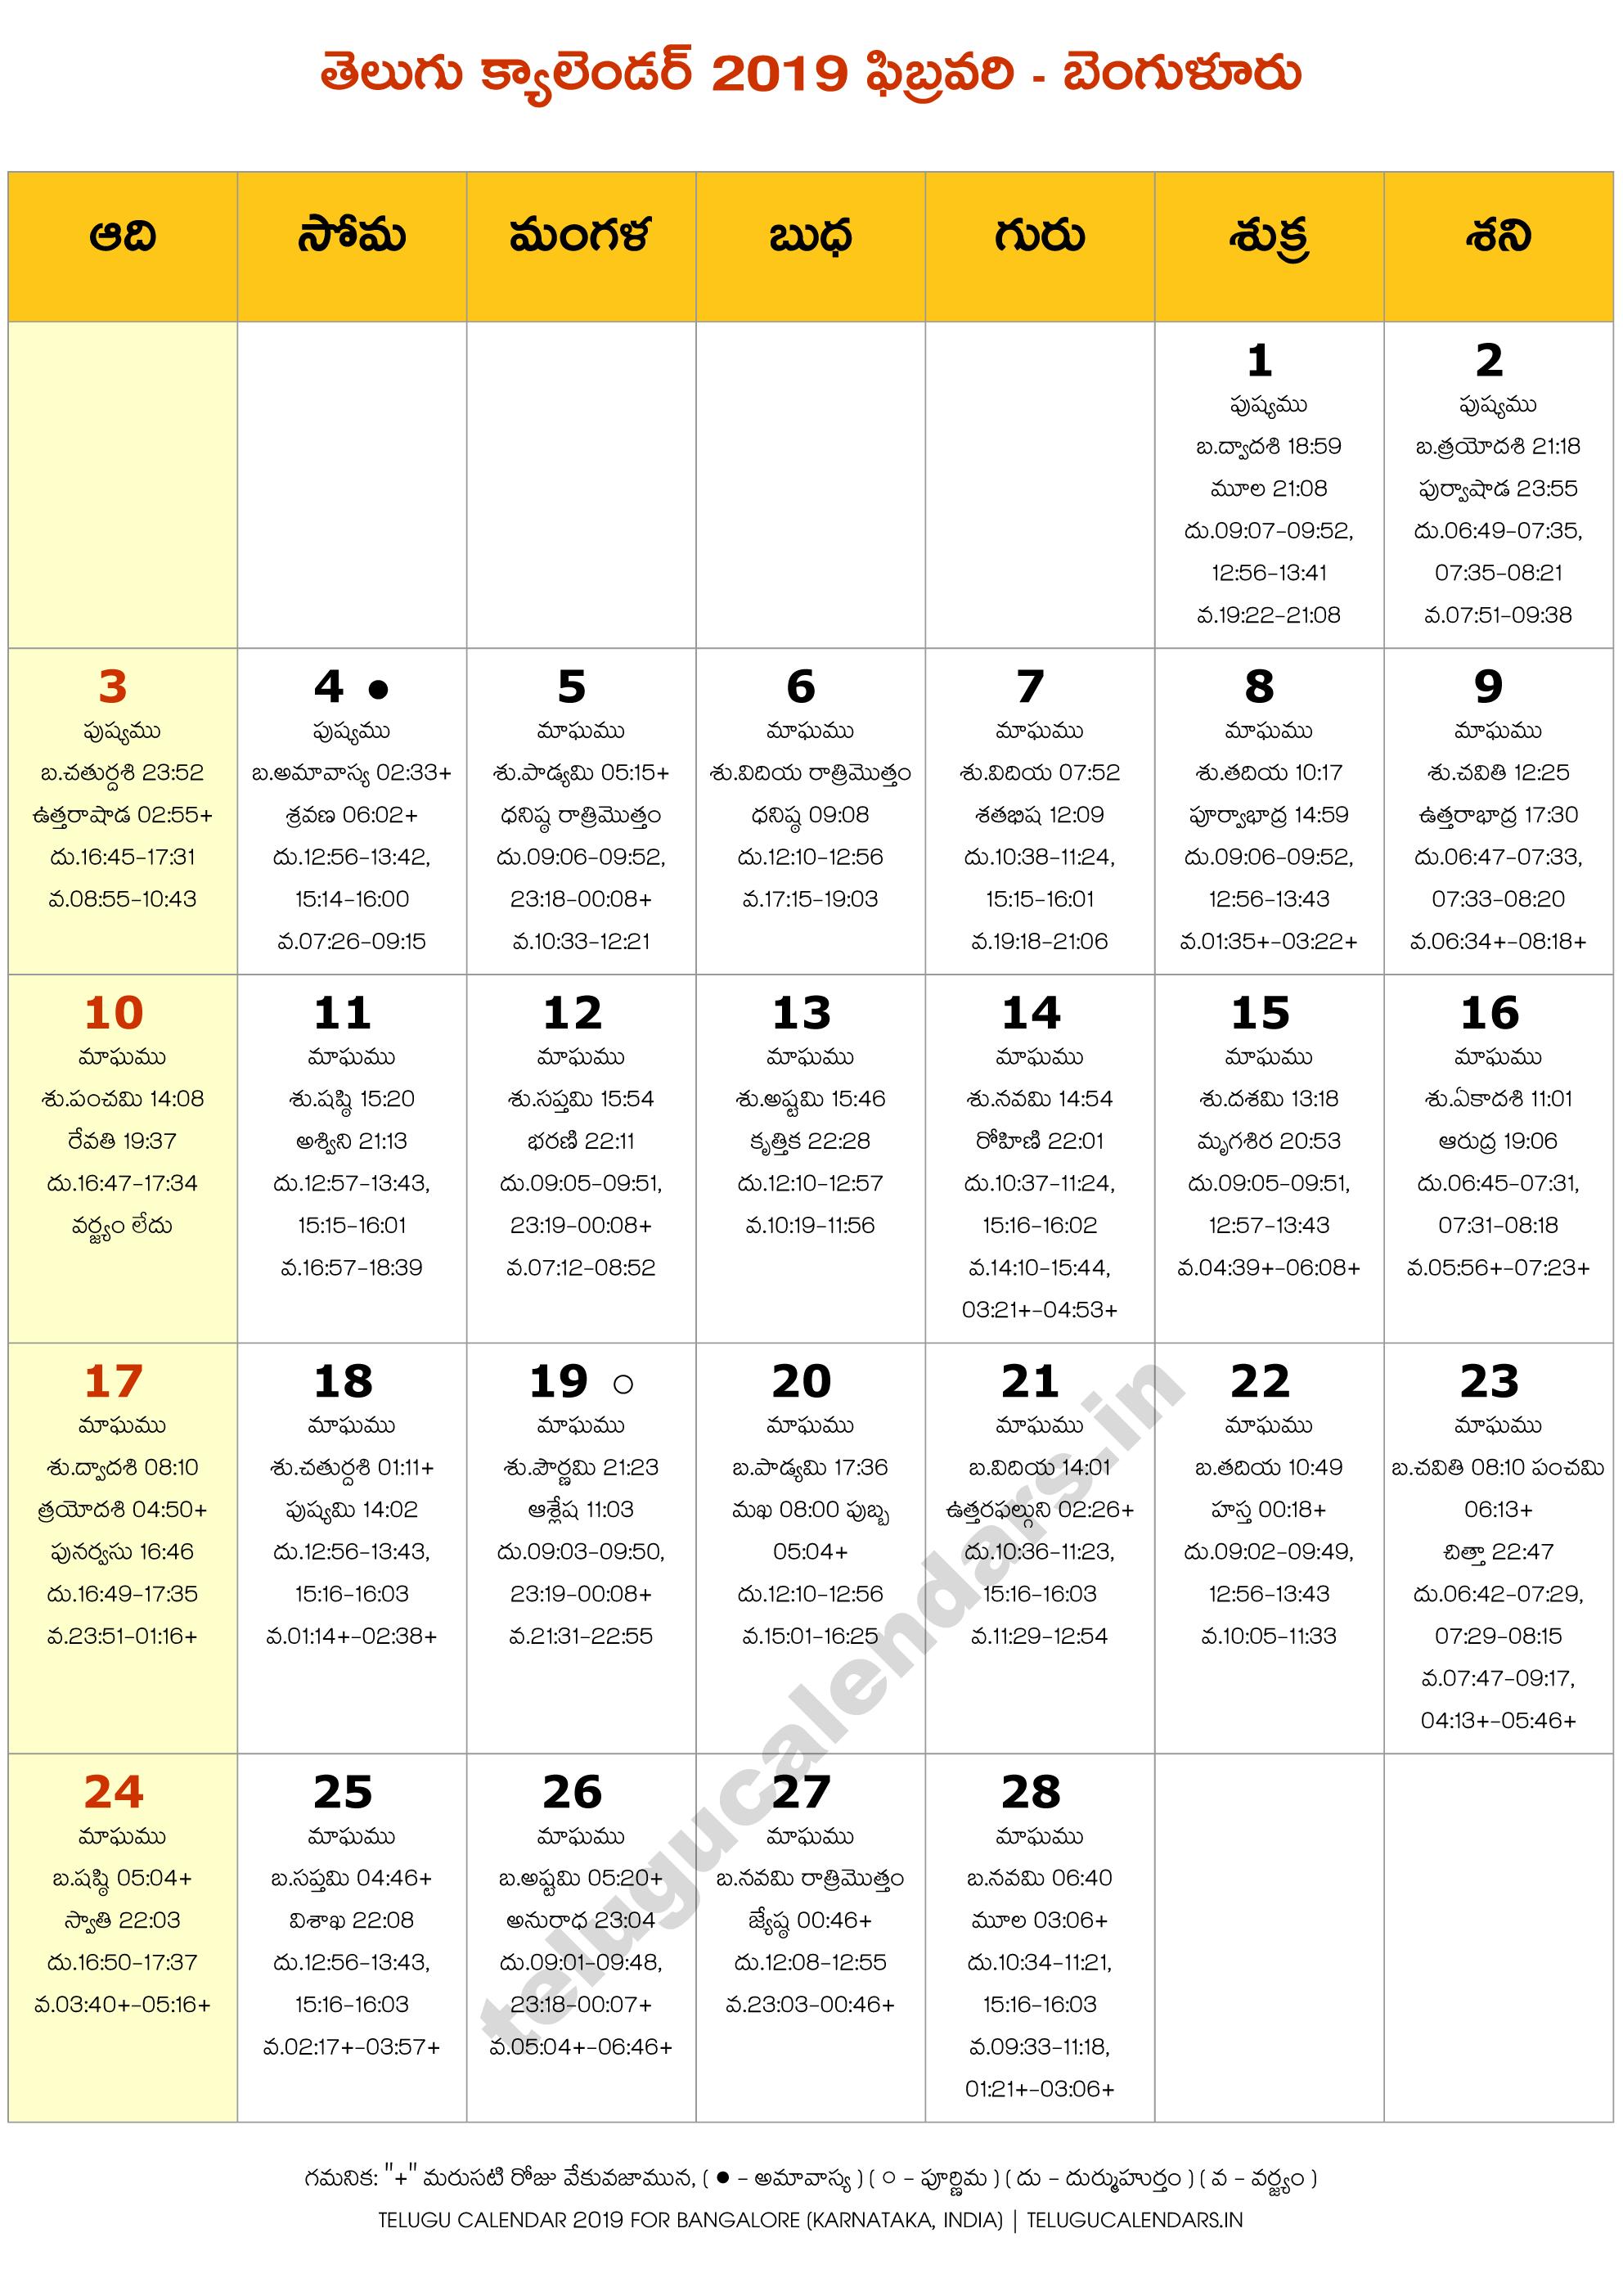 bengaluru 2019 february telugu calendar